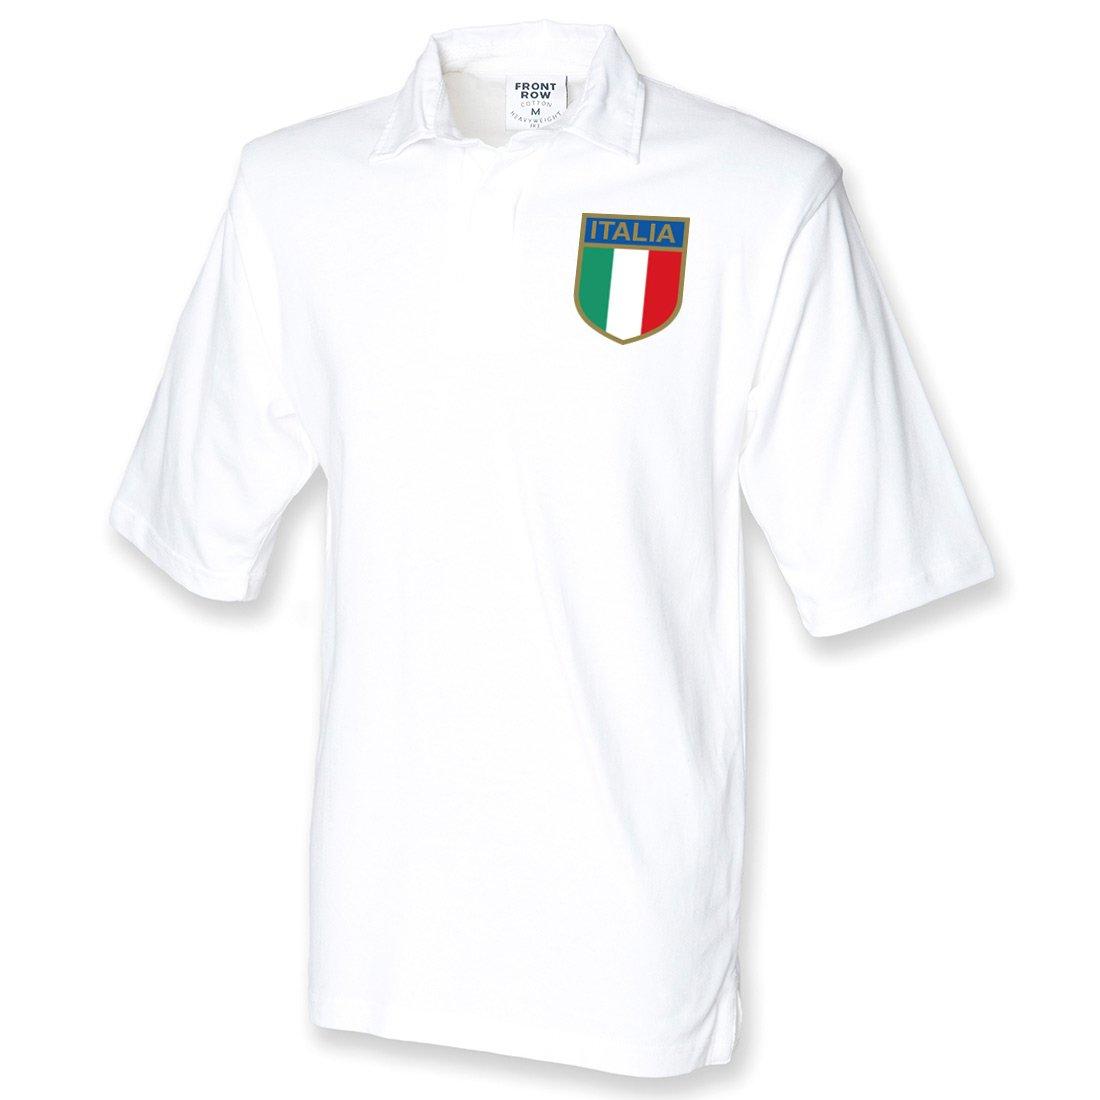 Hombres del Vintage Bordado Escudo del Italiano Italia Italia ...